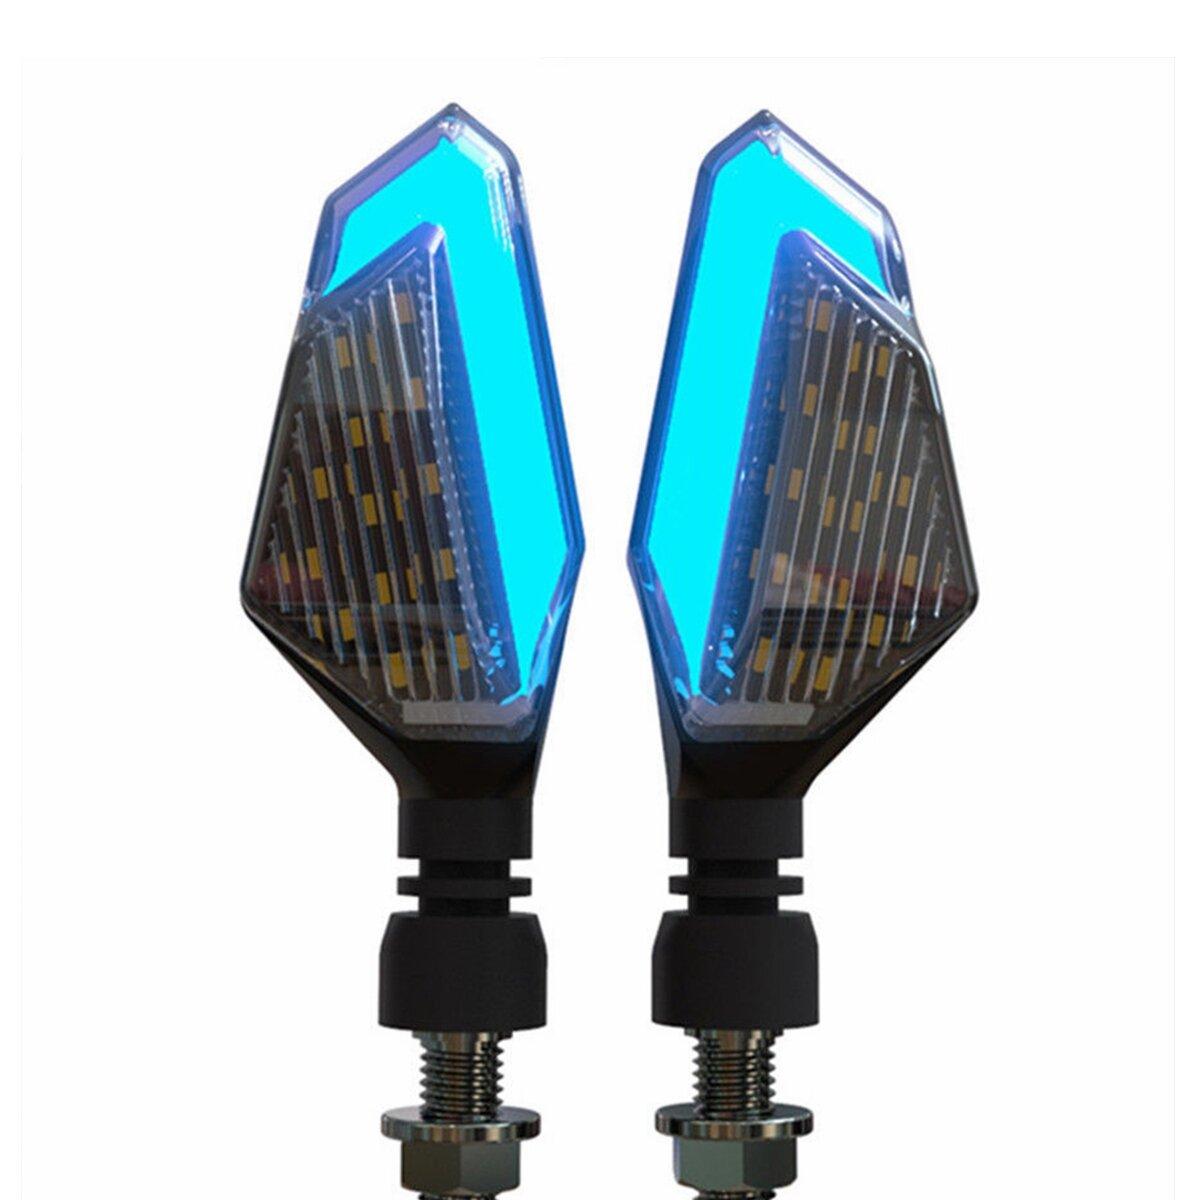 12V Motorcycle LED Turn Signal Lights Running Daytime Light Brightness DRL